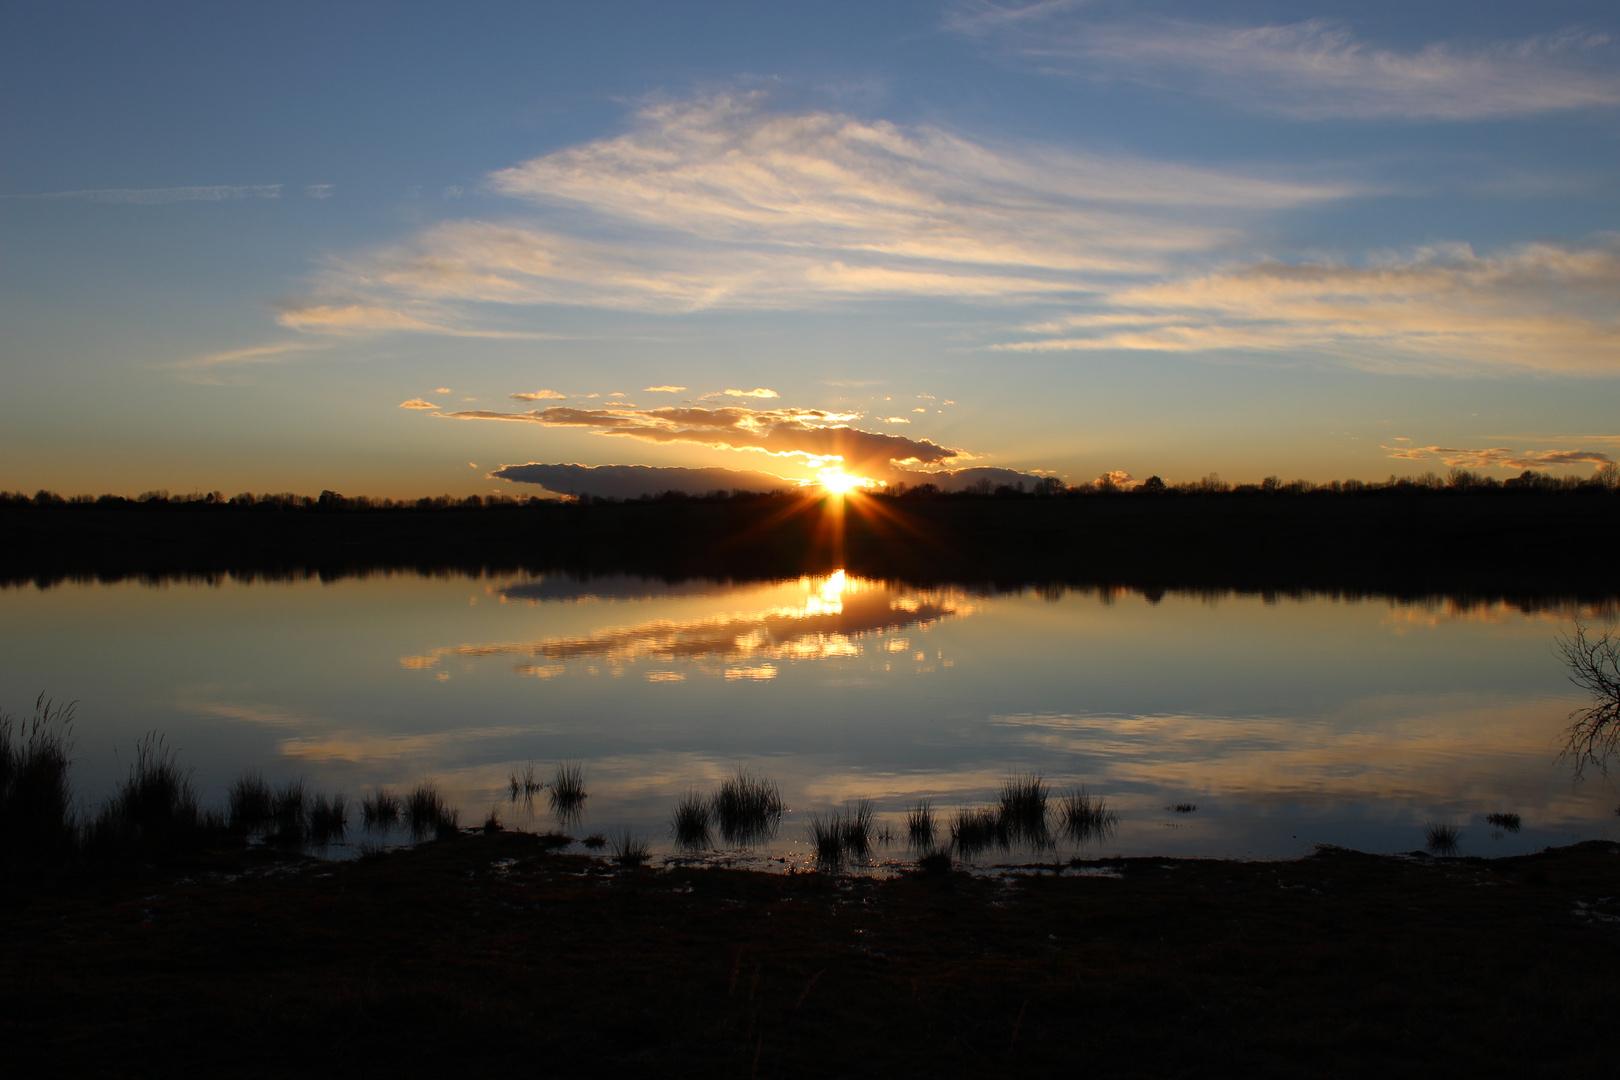 Sonnenuntergang Baggersee